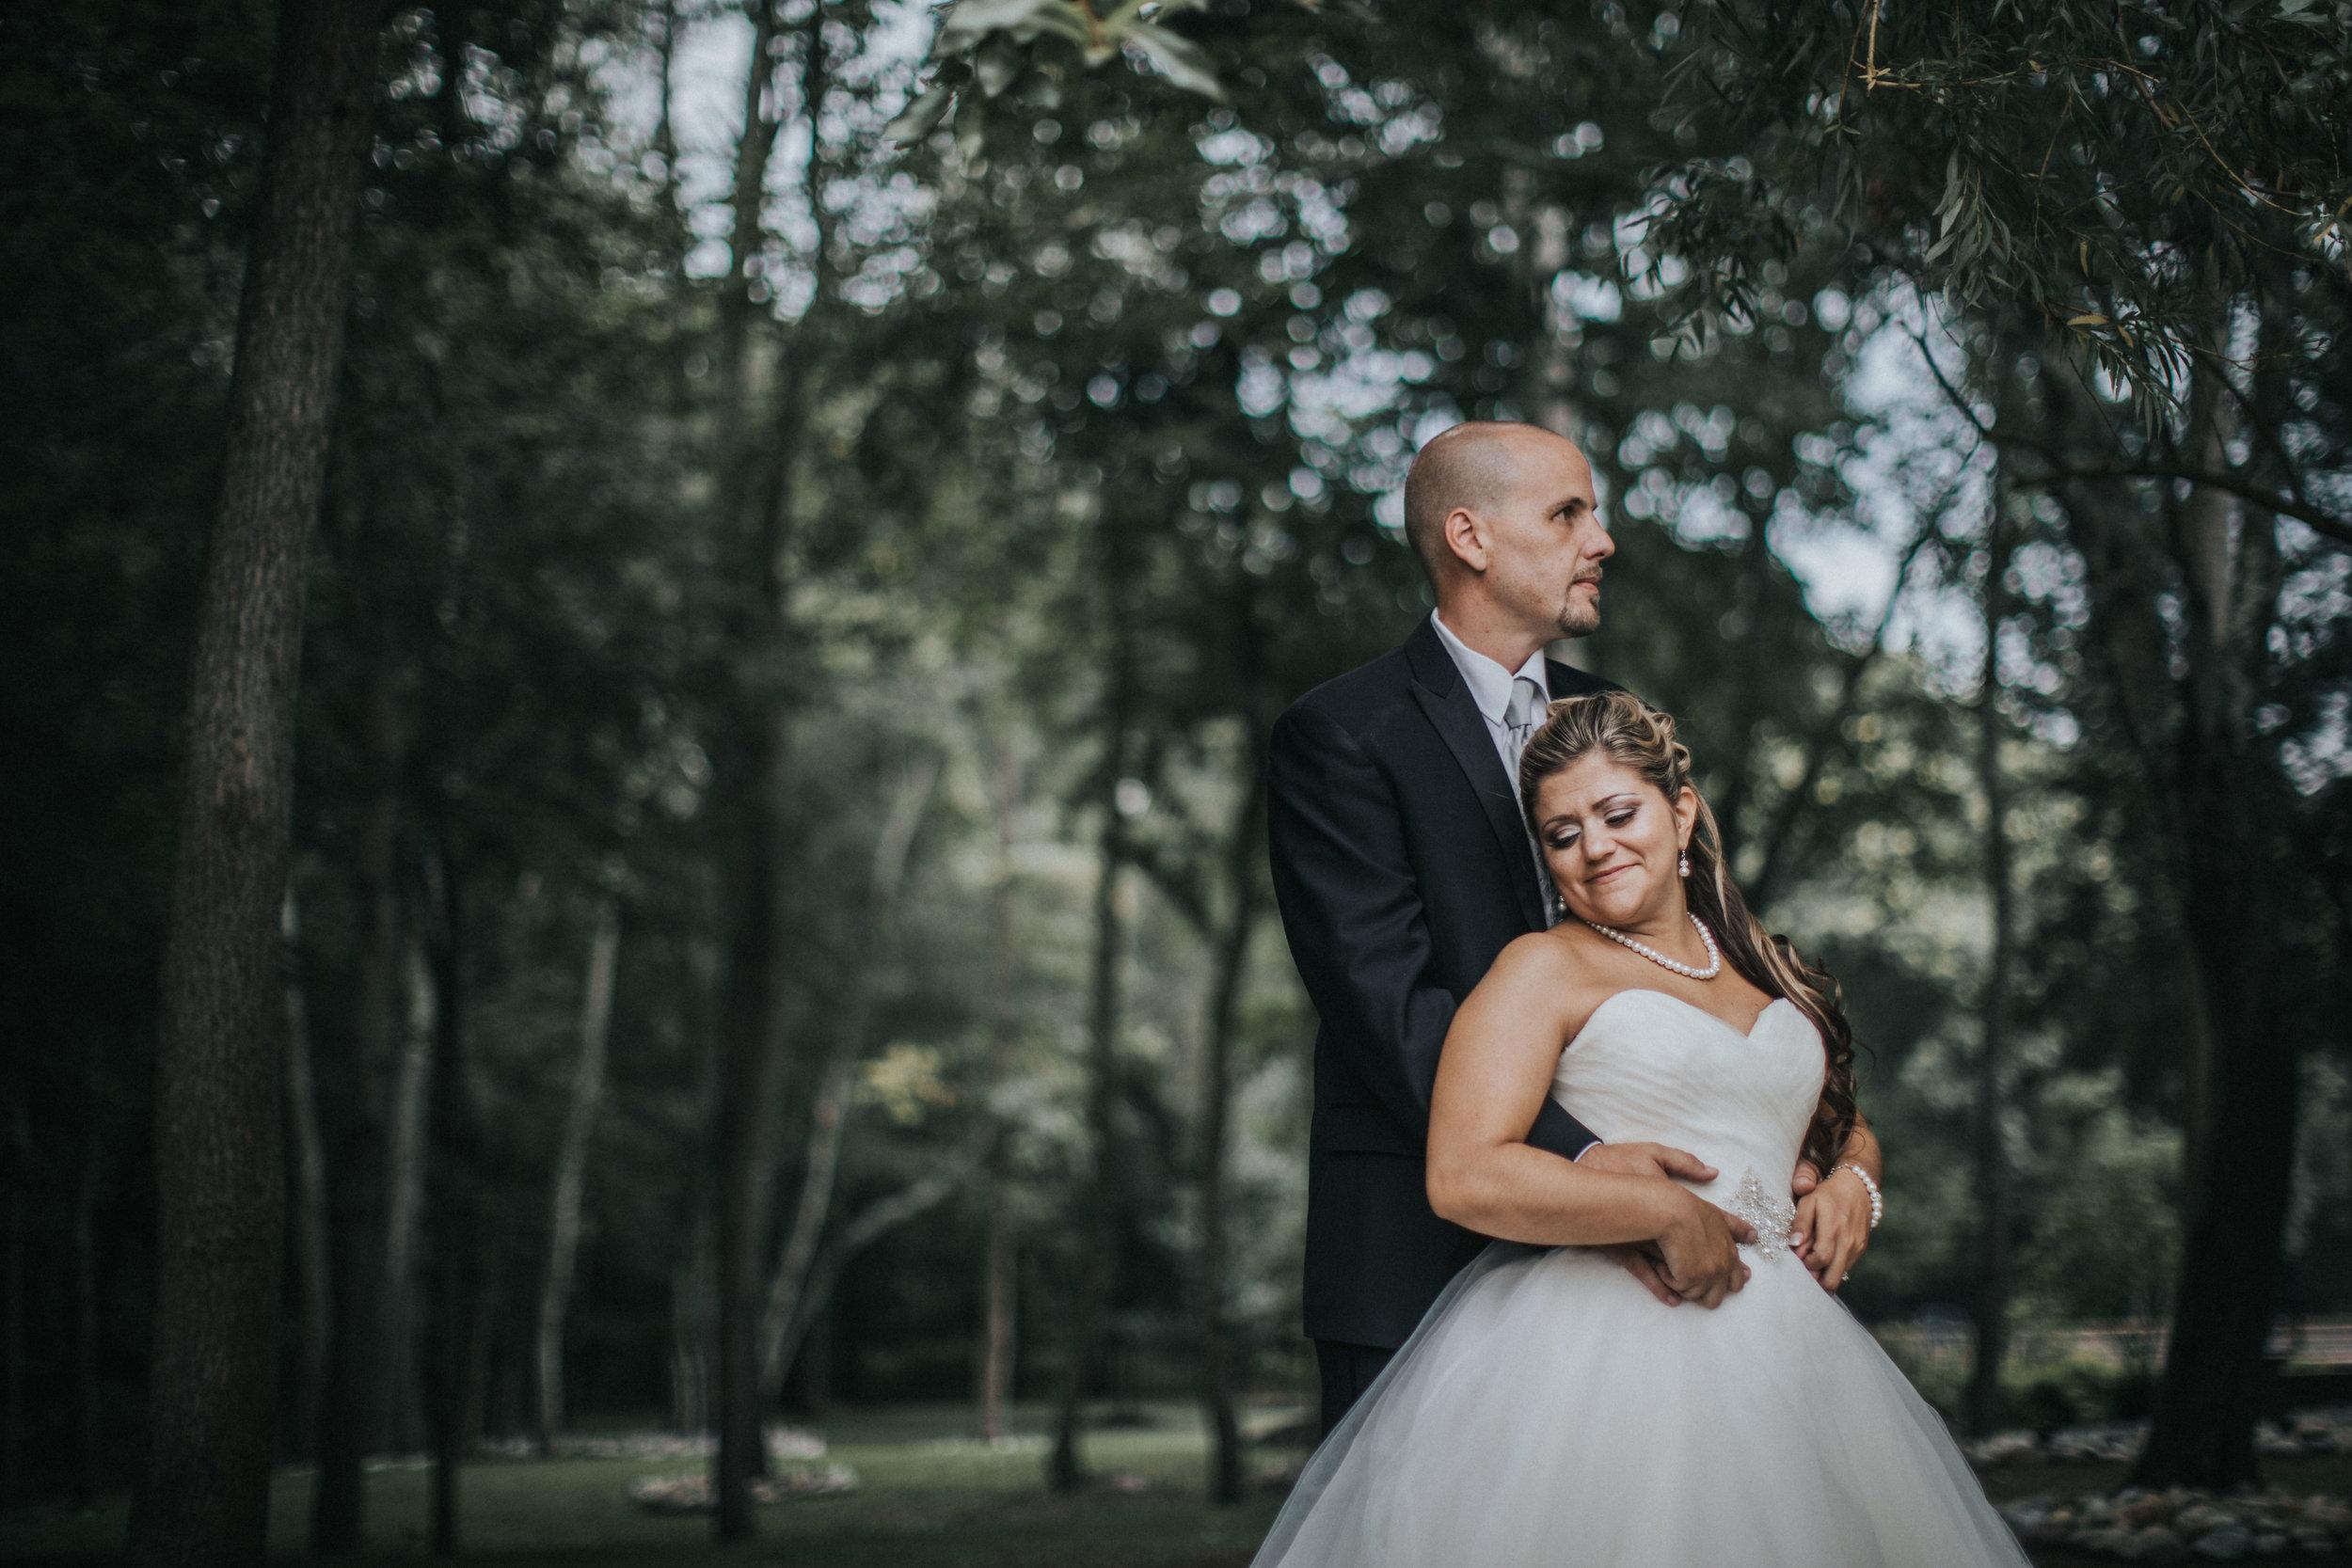 NewJersey_Wedding_Photography_Brigalias_Bride&Groom_Tara&Pete-64.jpg